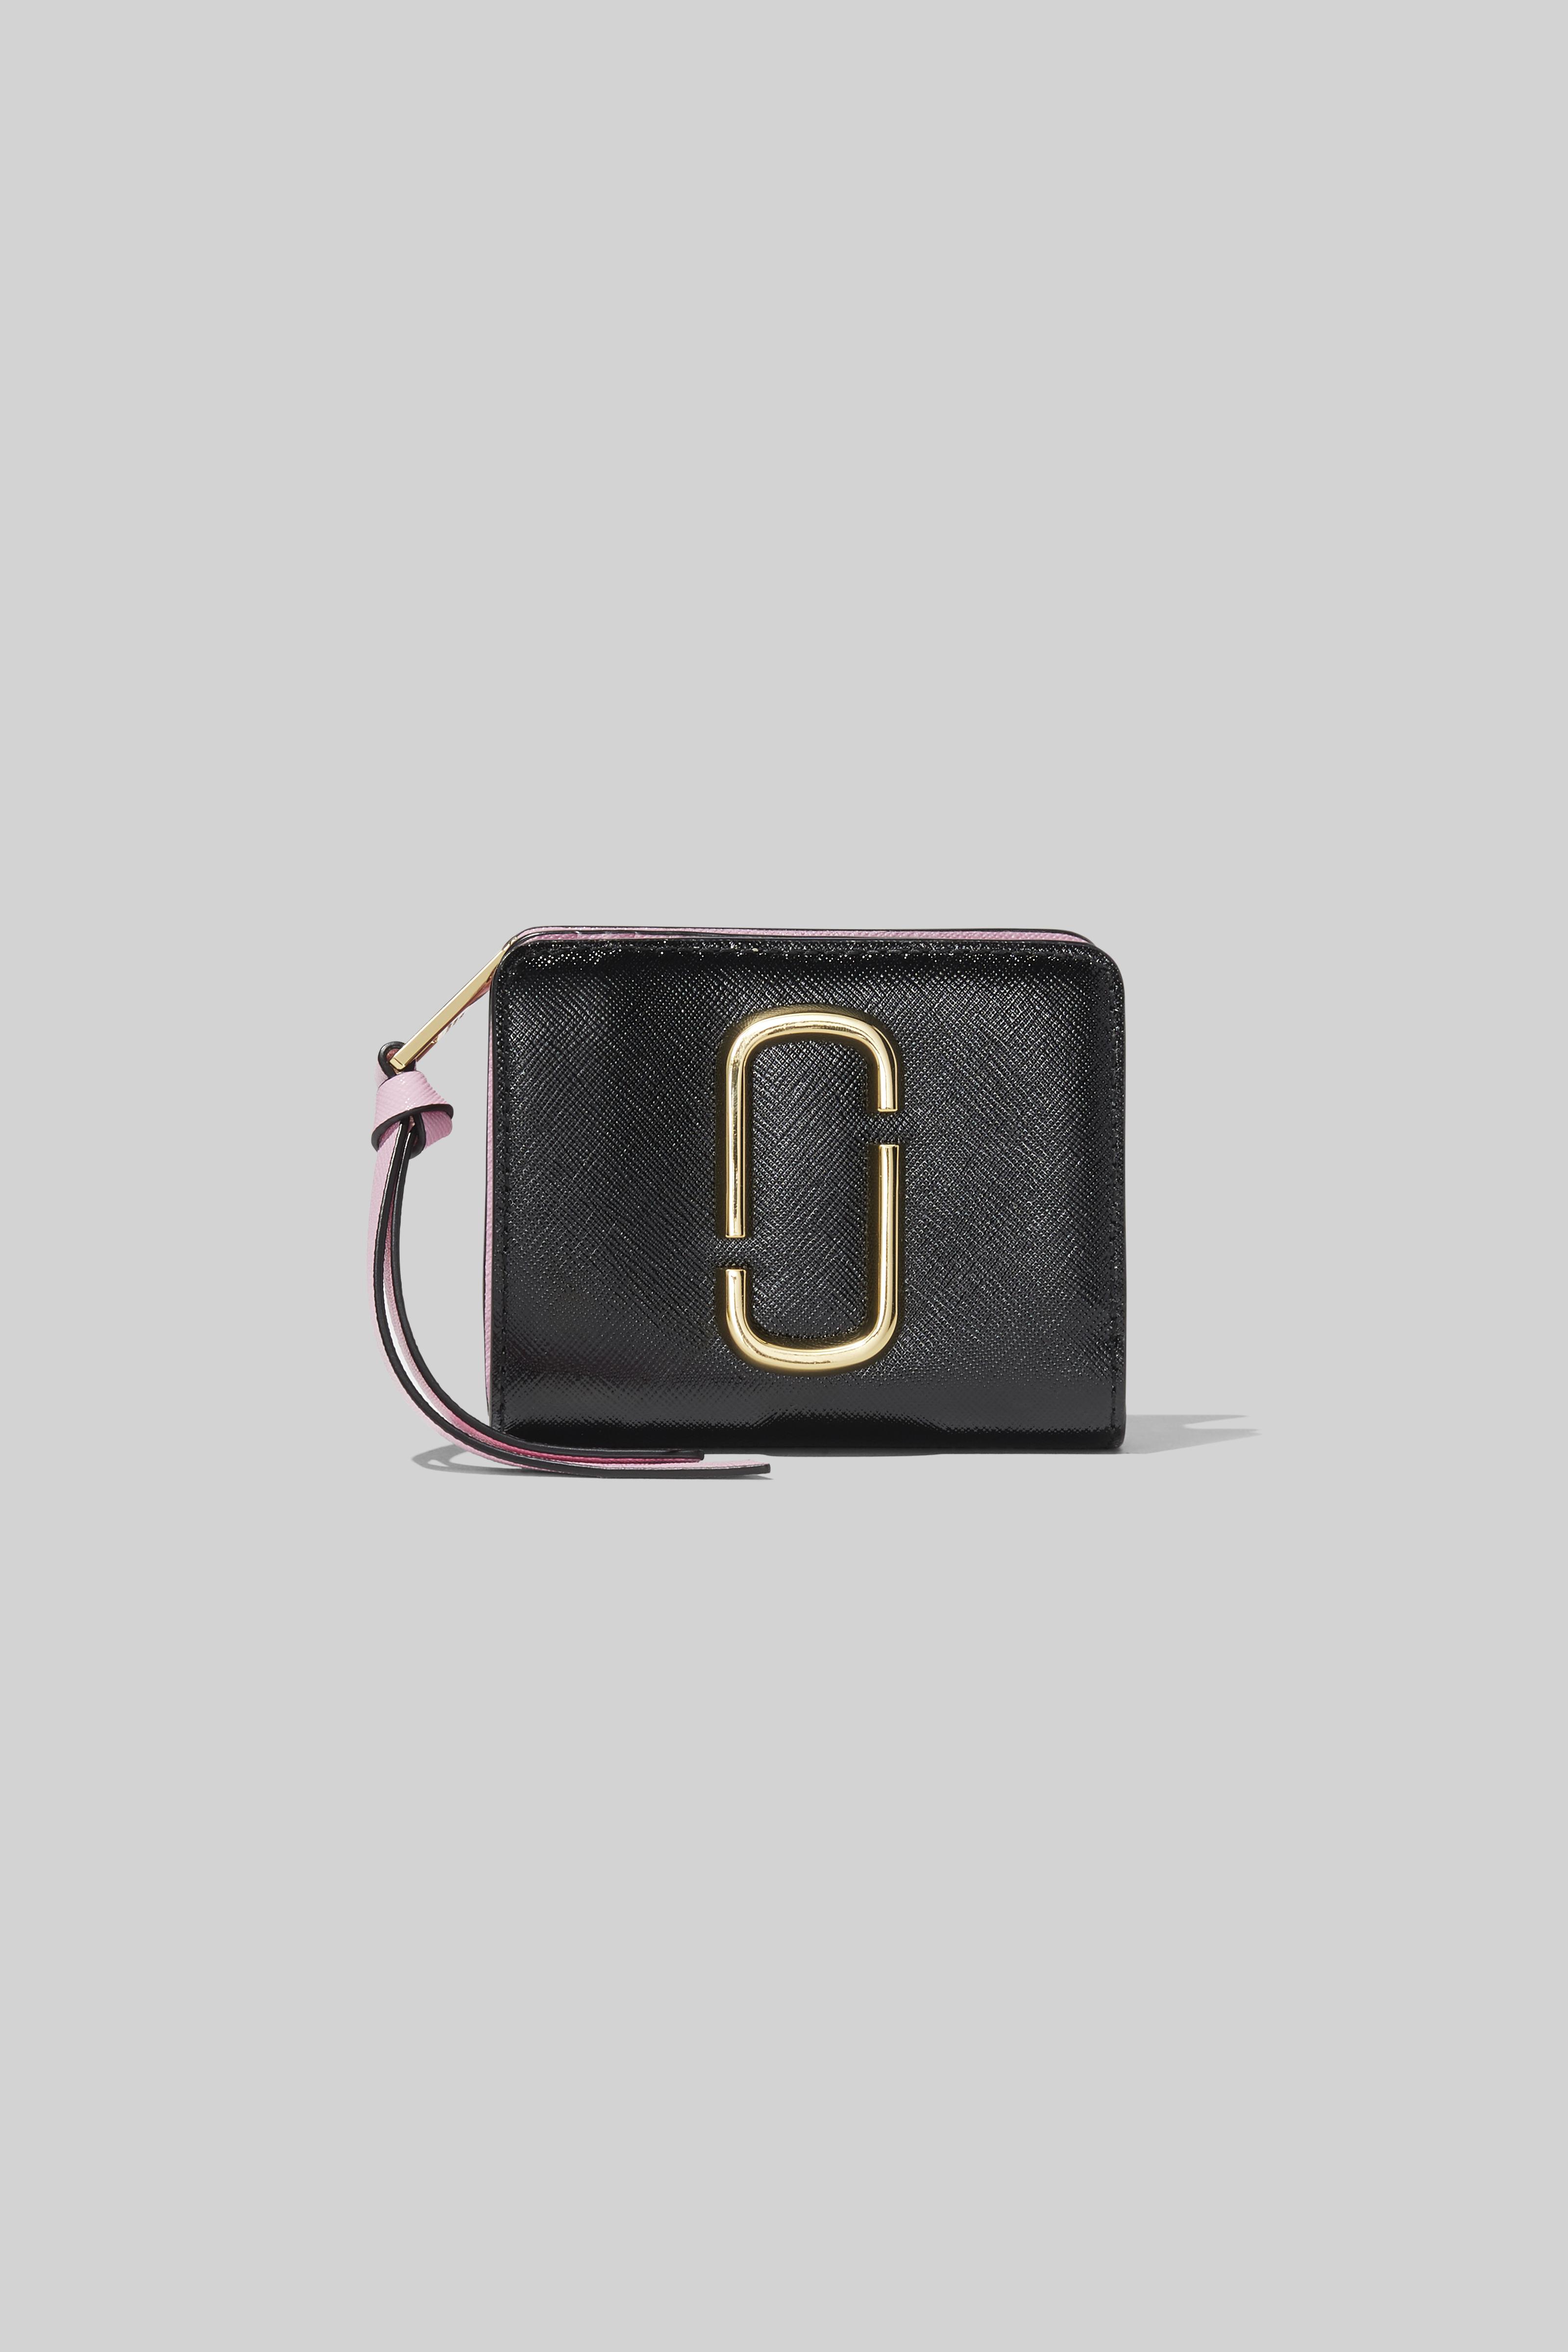 Marc Jacobs The Snapshot mini pung